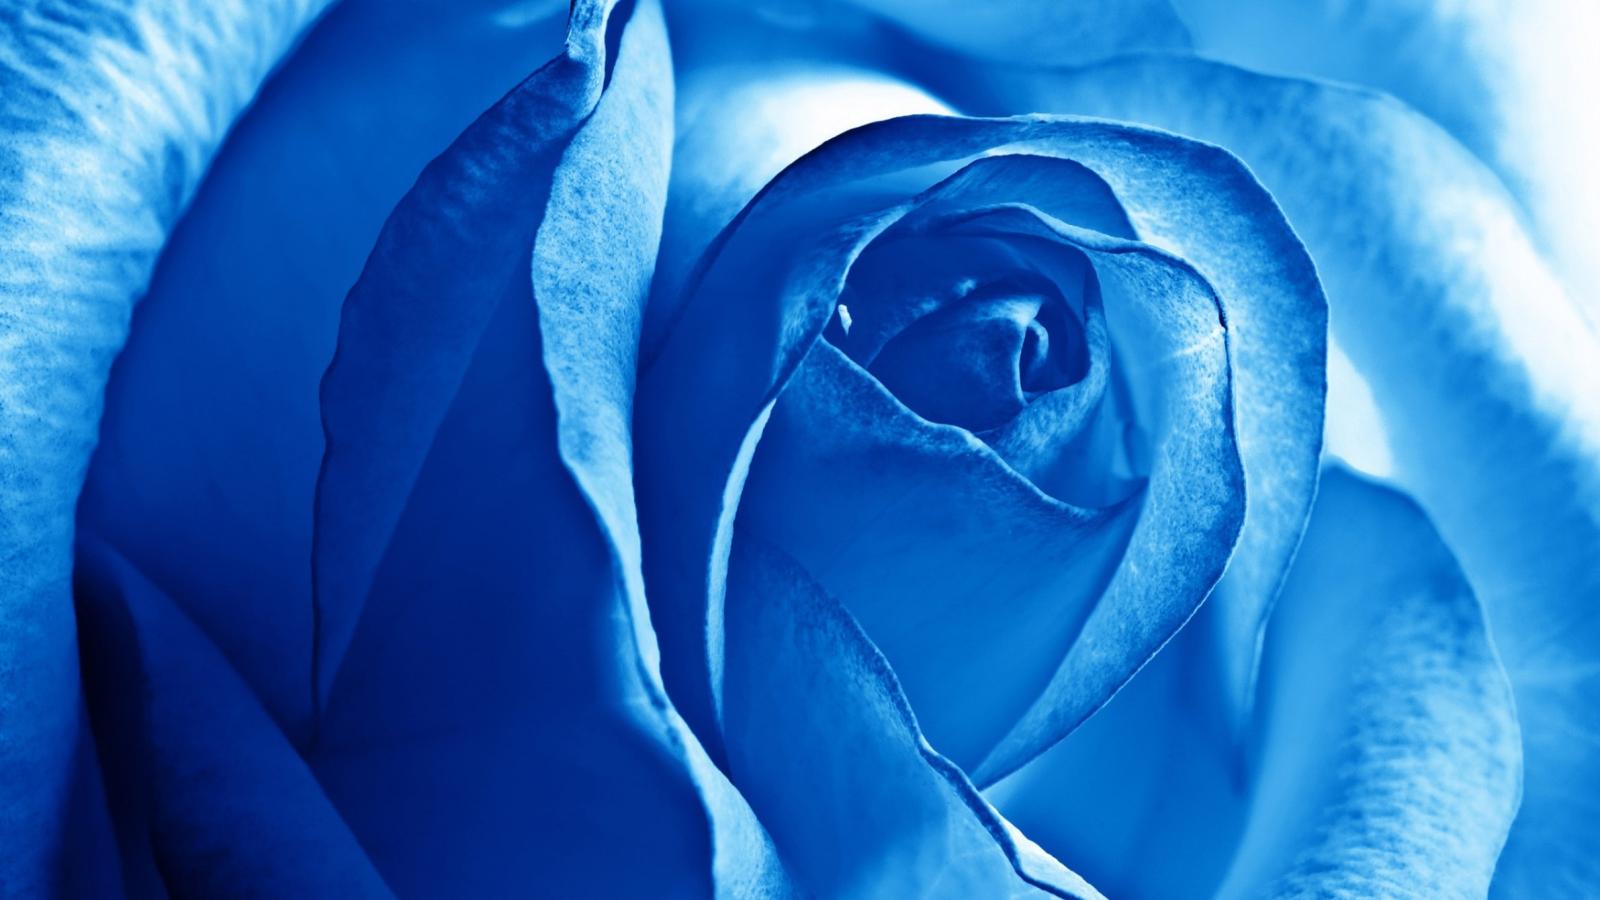 синий цвет фото картинки дозаторов